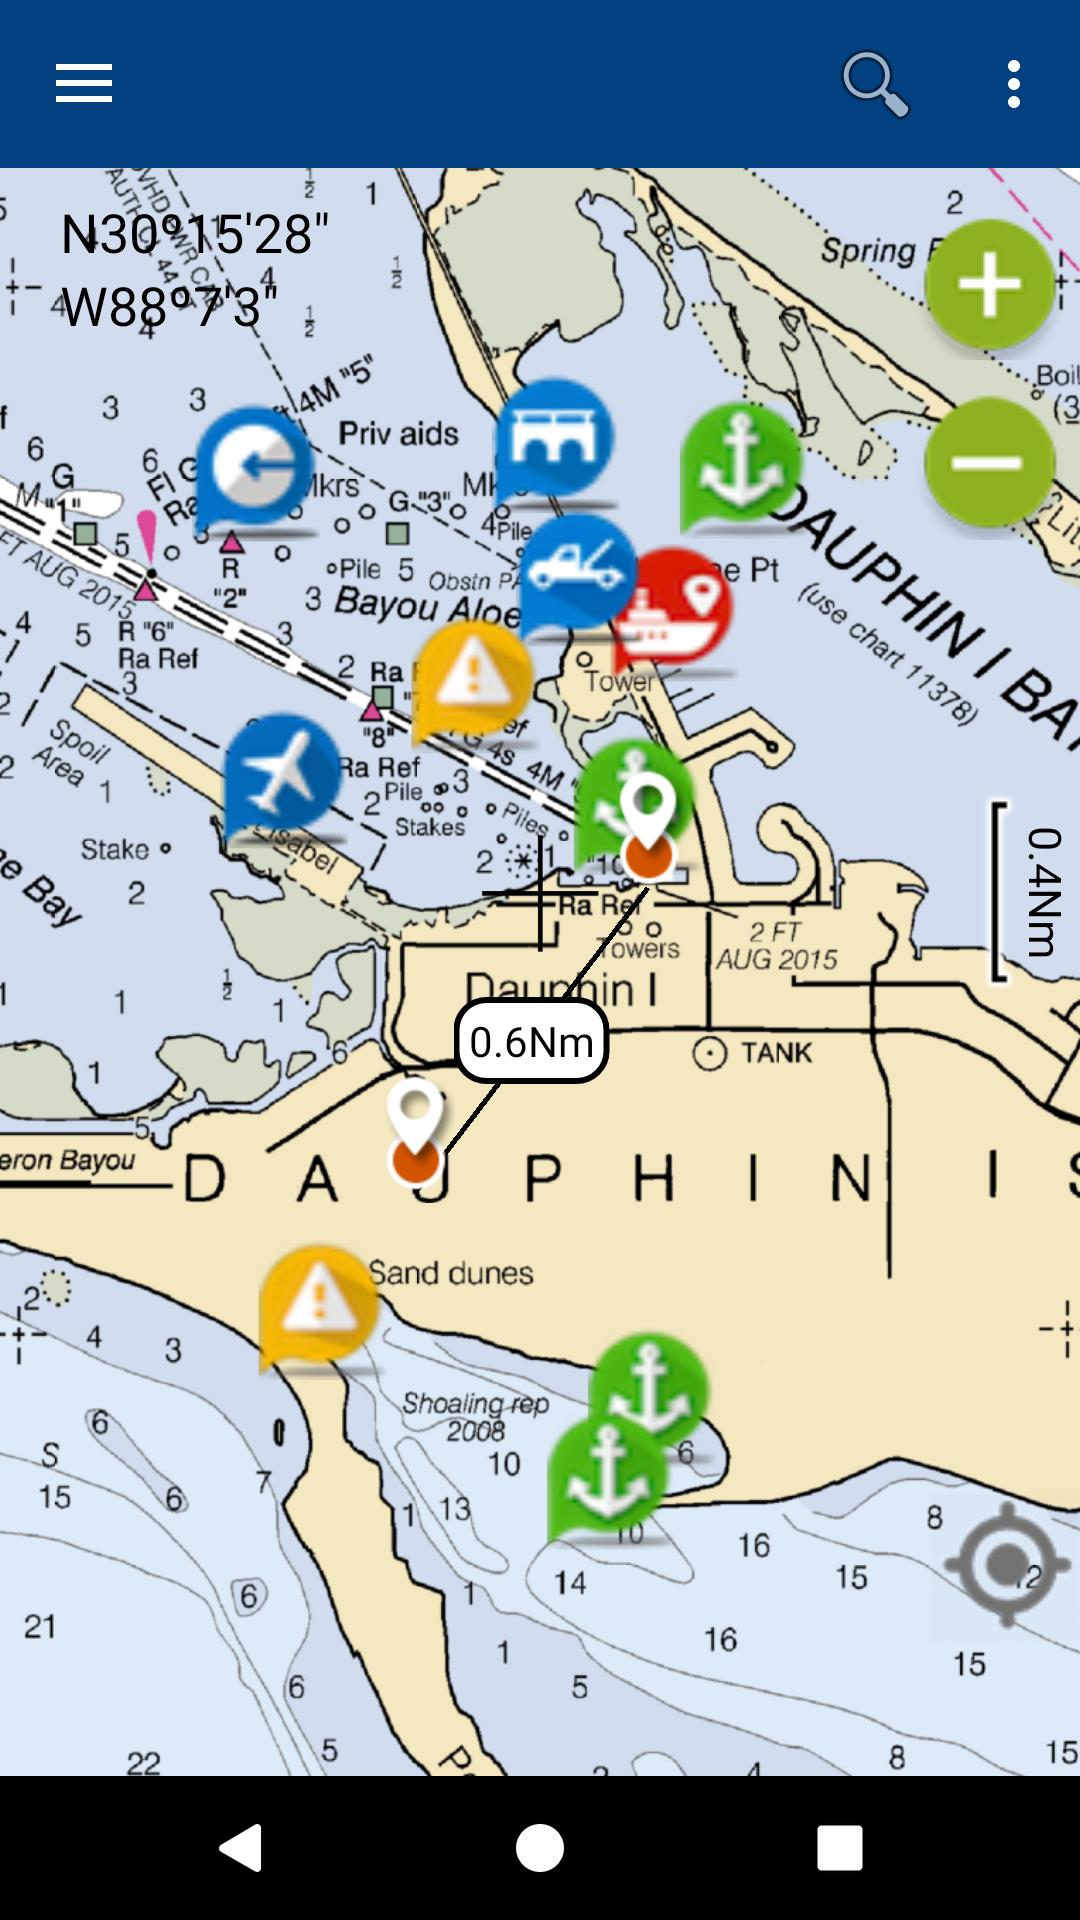 Lake Lanier gps map navigator: Amazon.es: Appstore para Android